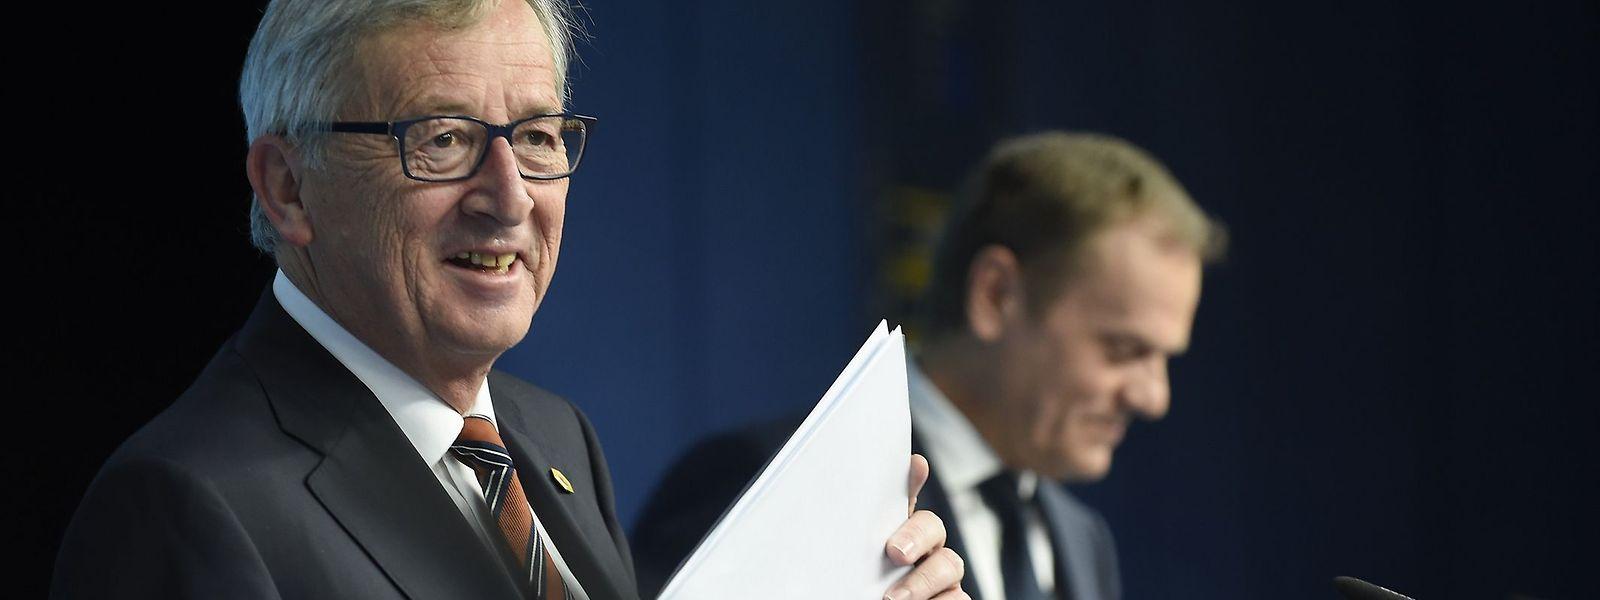 Jean-Claude Juncker e Donald Tusk durante a conferência de imprensa conjunta